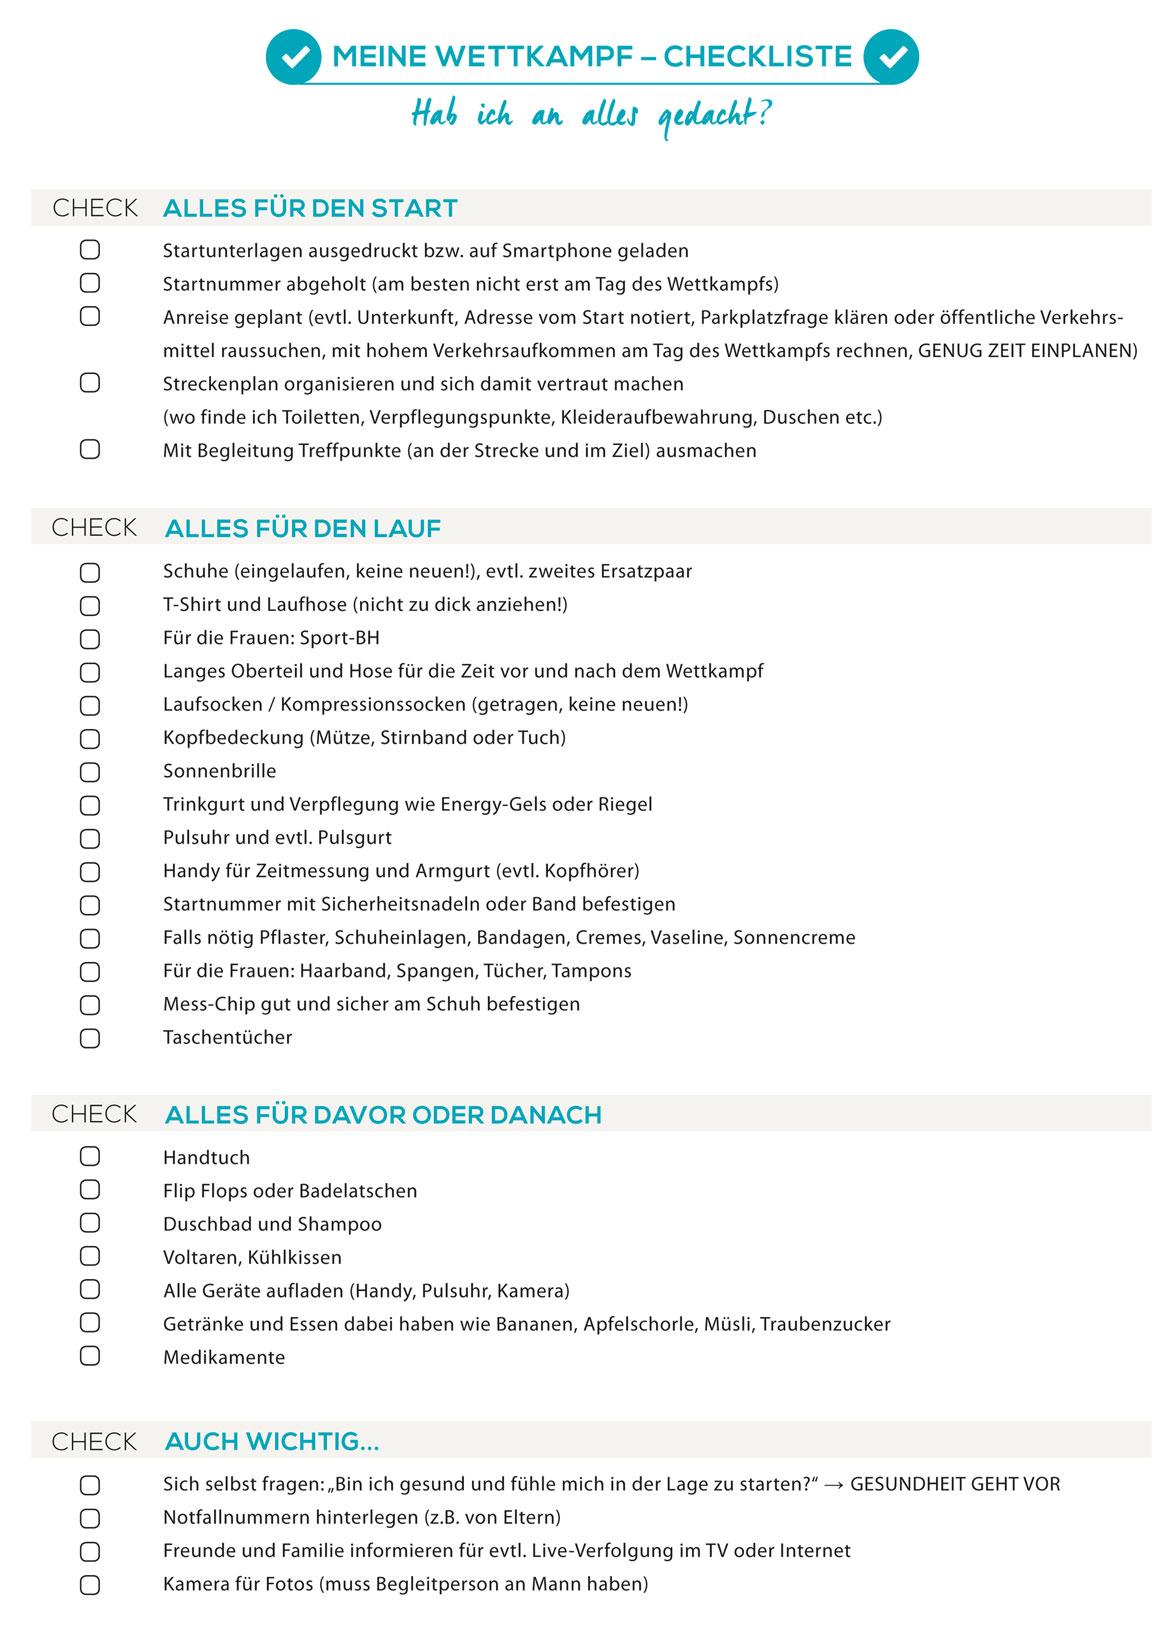 Wettkampf-Checkliste